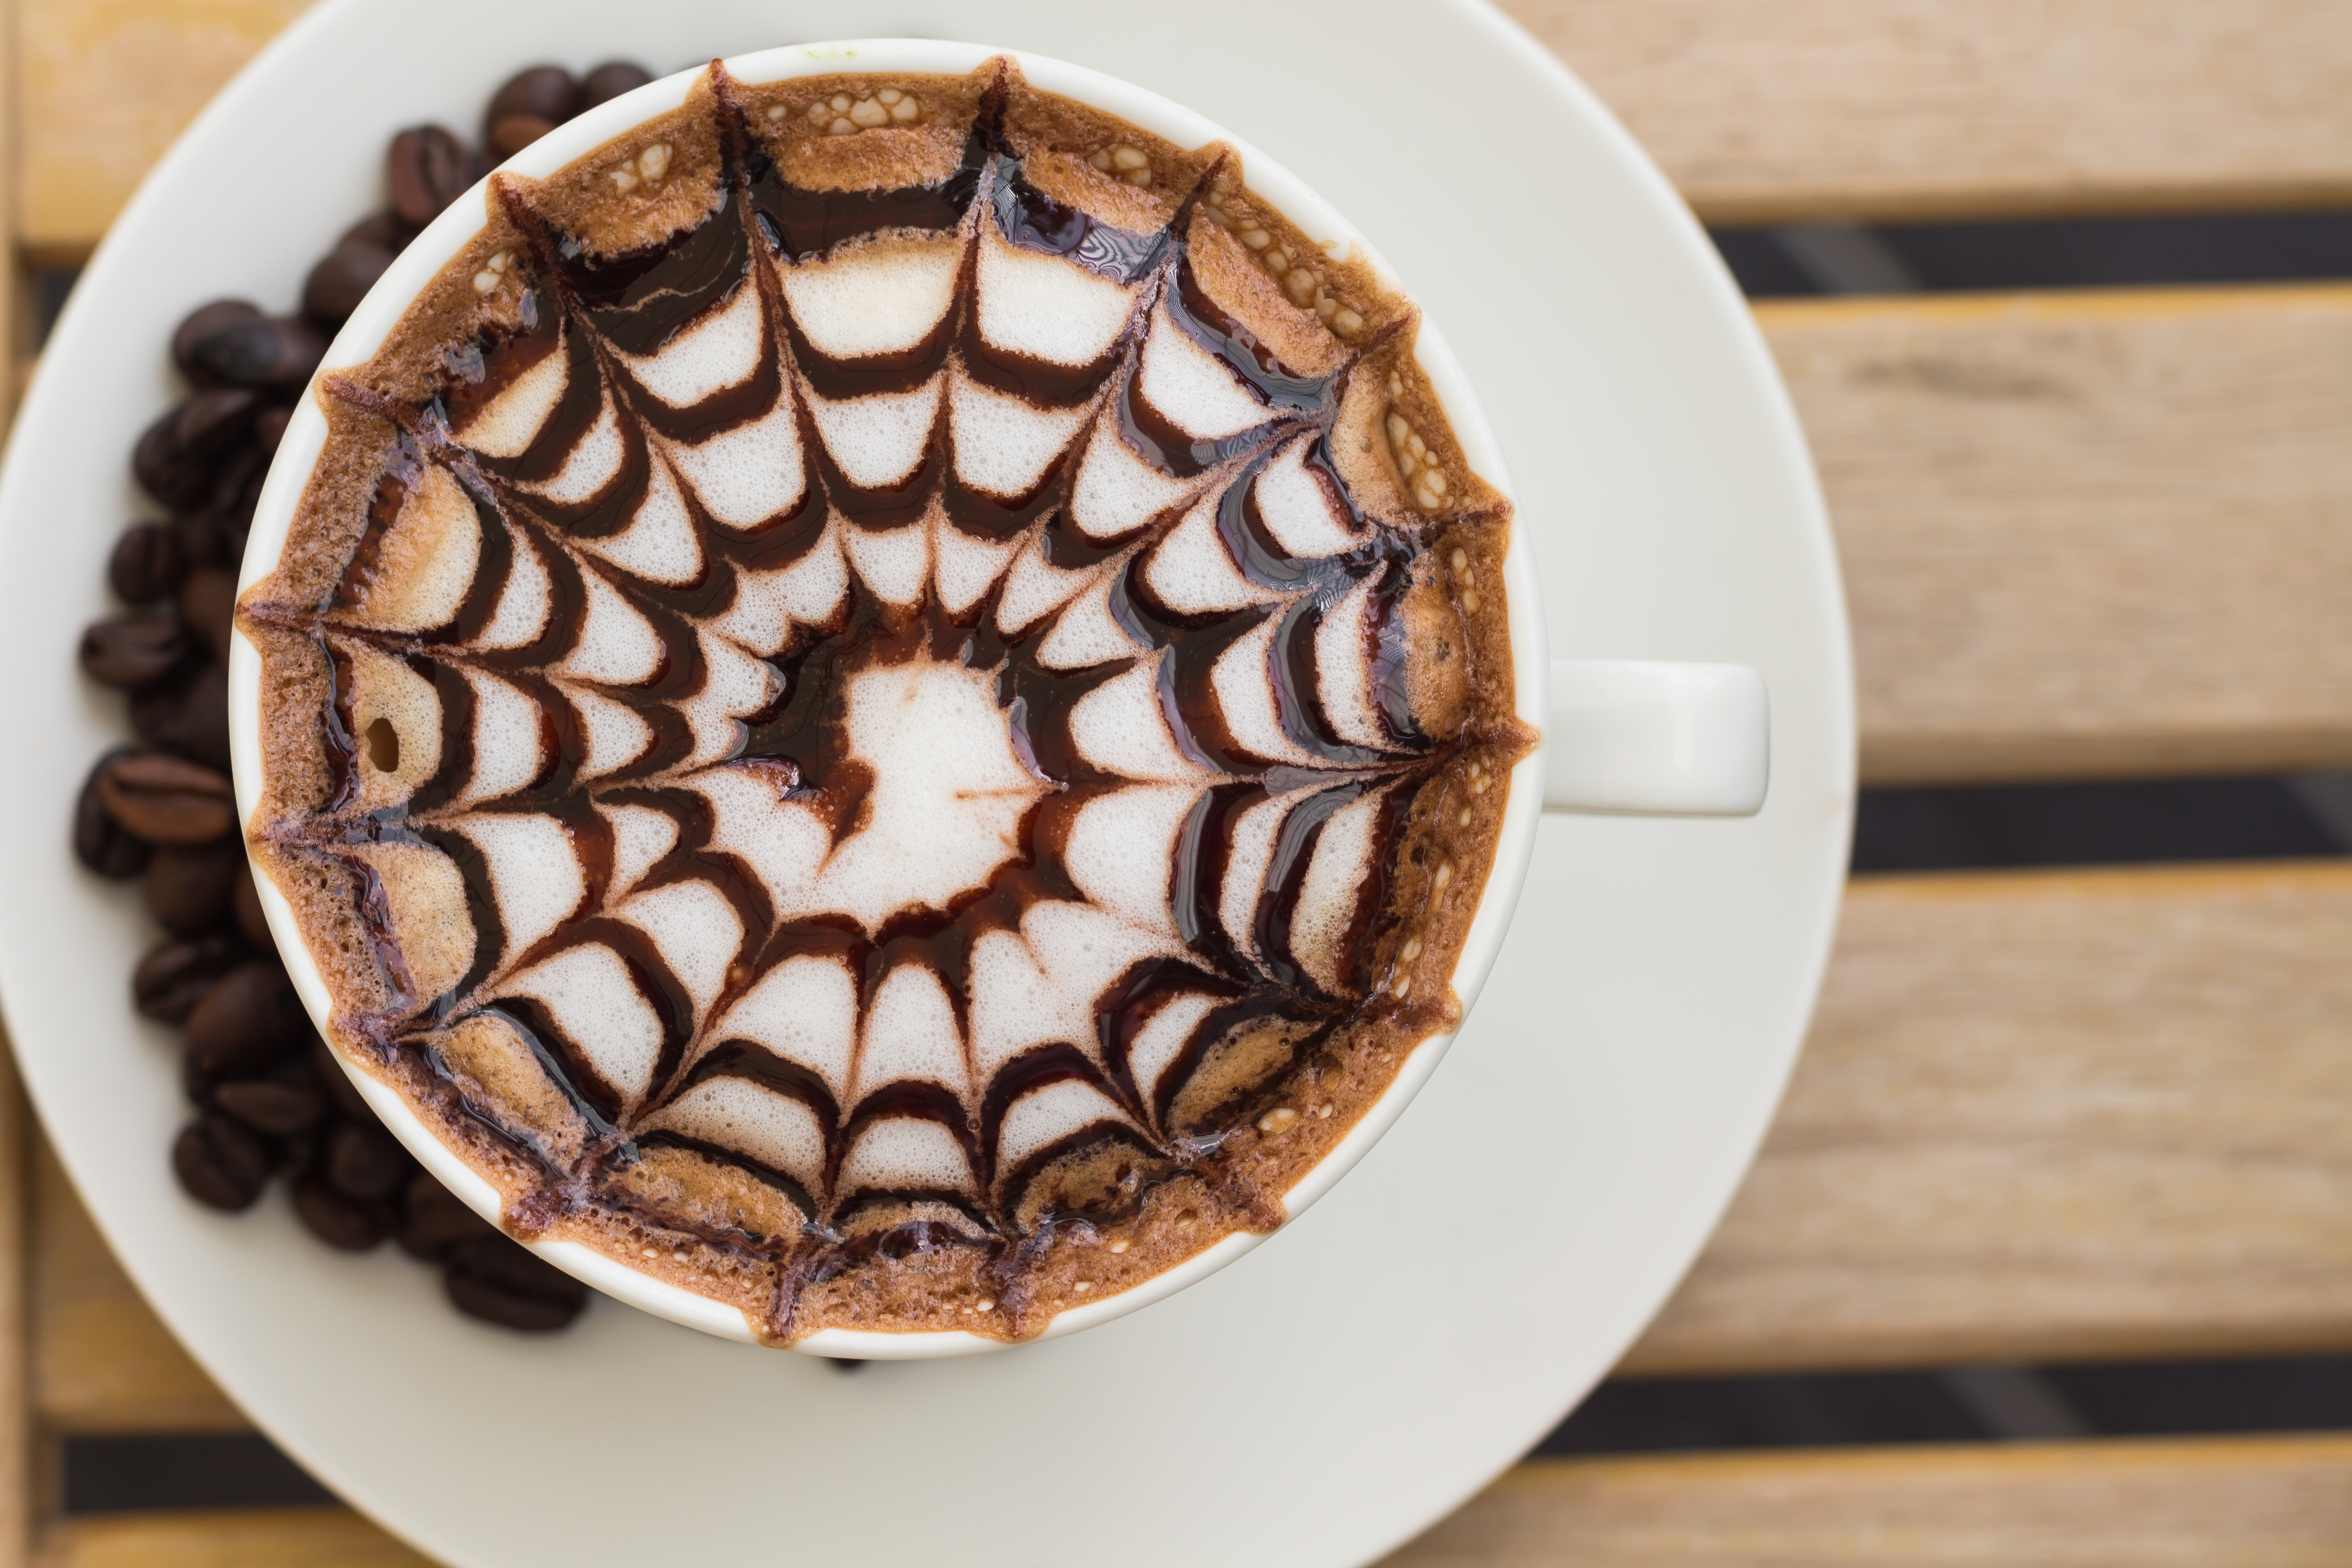 Coffee in White Ceramic Mug, Art, Espresso, Top view, Sweet, HQ Photo